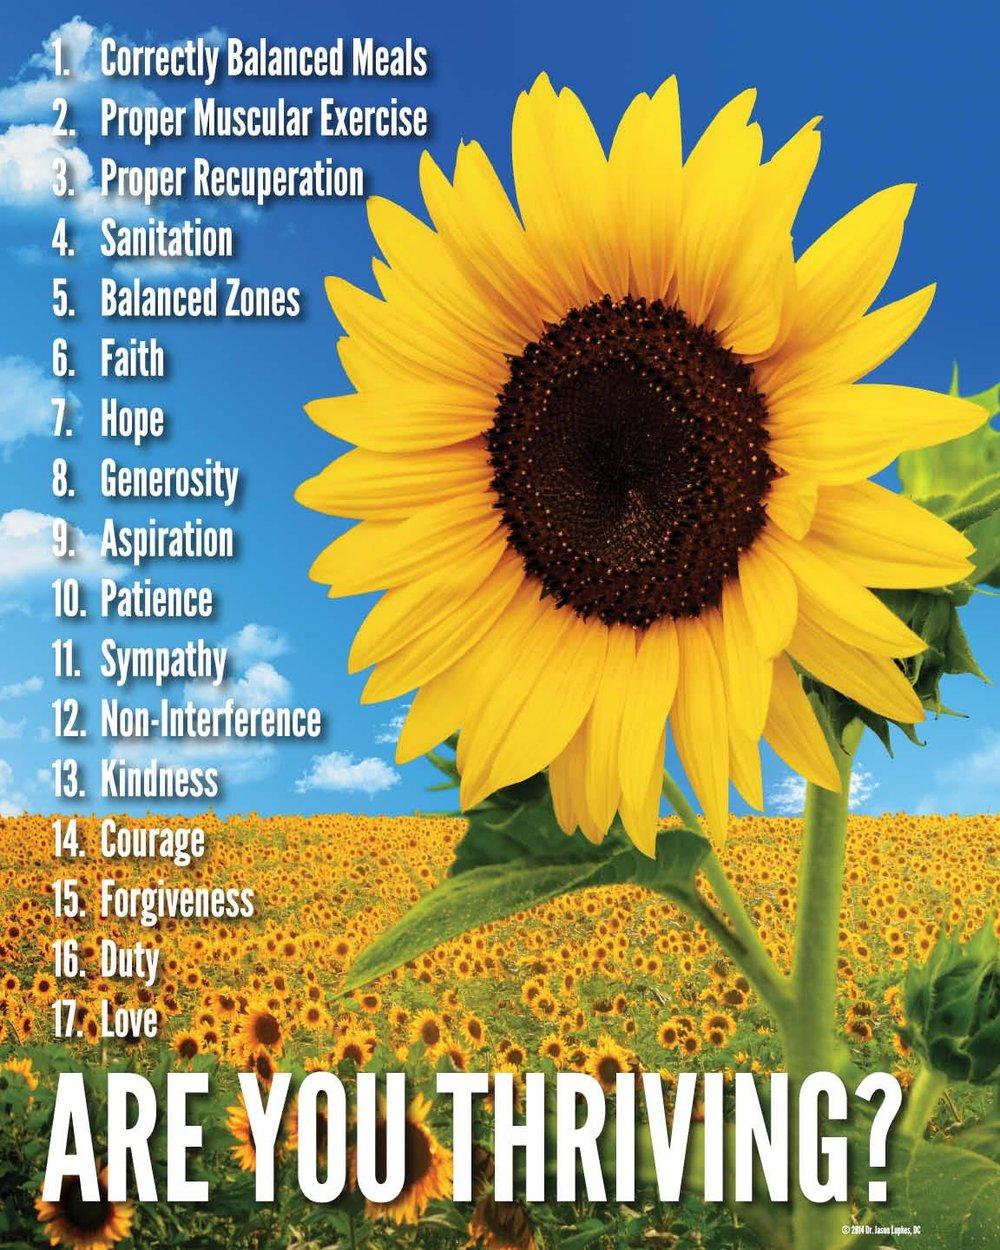 Thriving Poster Correct!.jpg